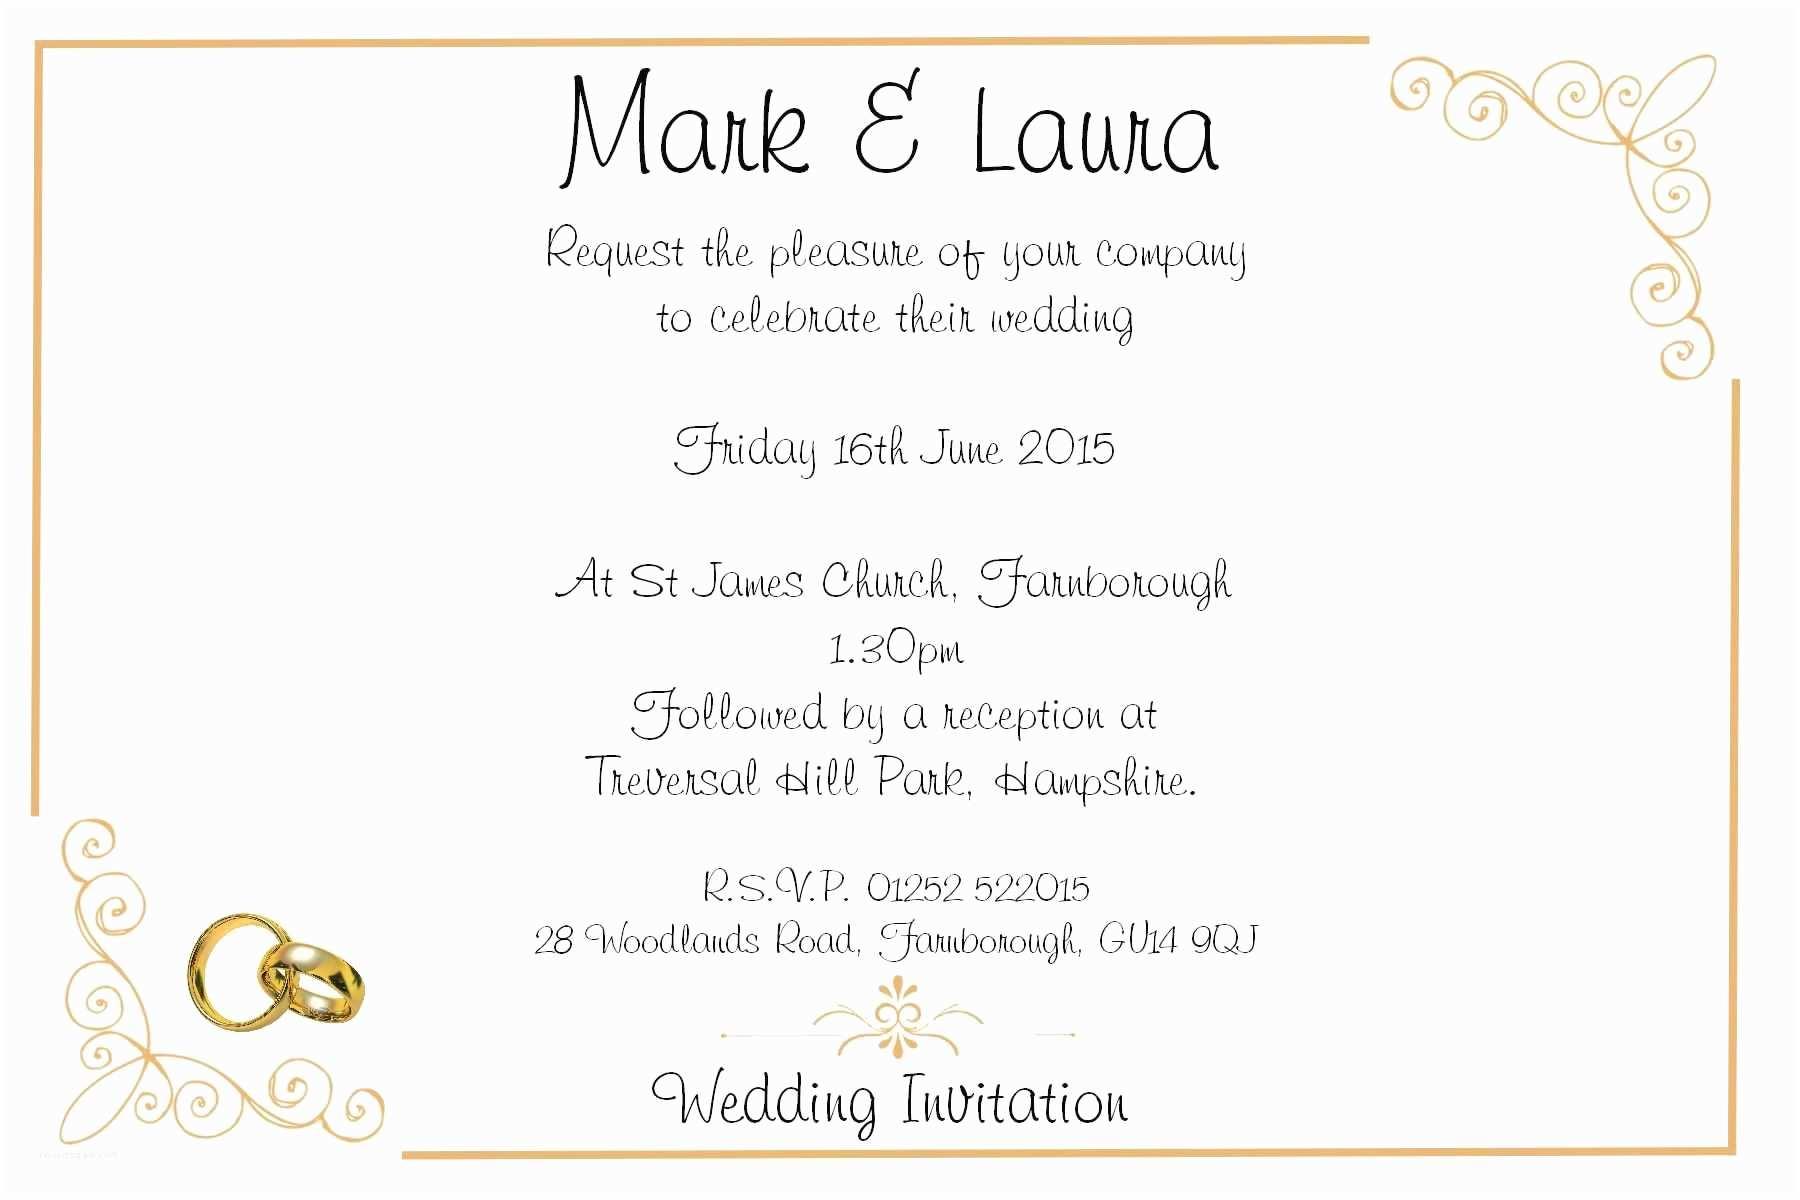 Wedding Reception Invitation Templates Wedding evening Reception Invitation Wording Examples